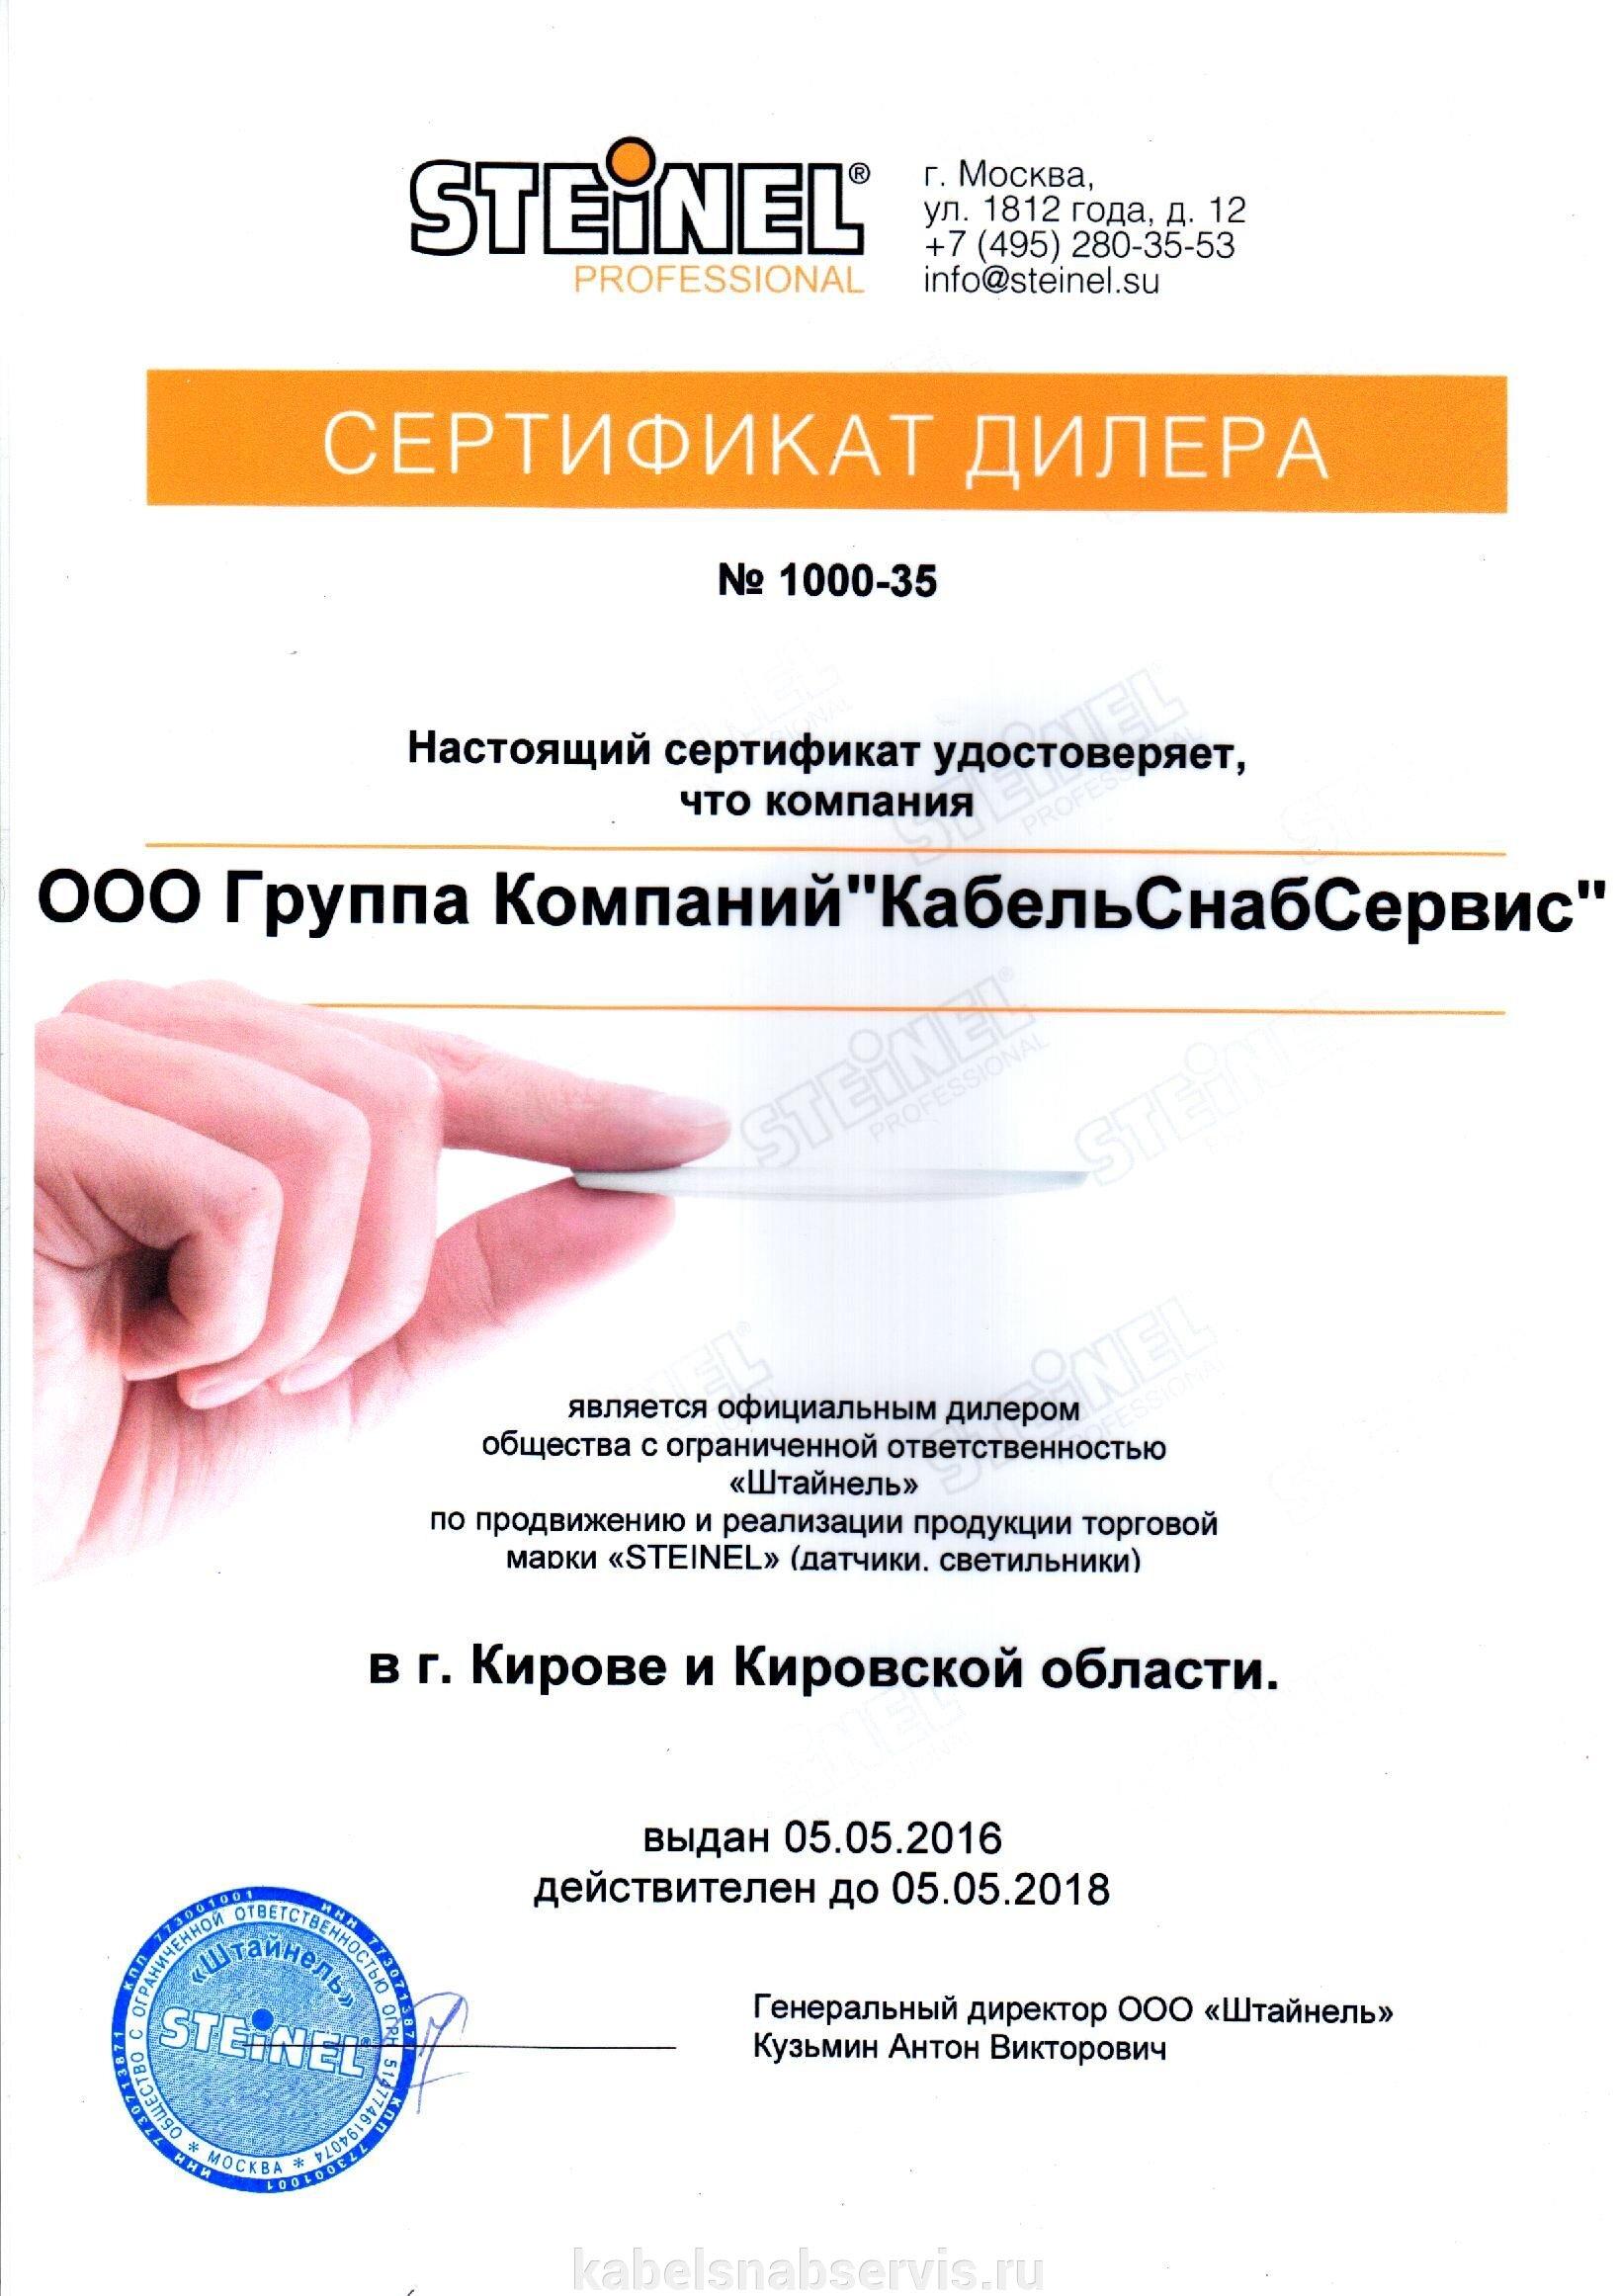 Сертификаты компании - фото pic_03e90098282394f_1920x9000_1.jpg